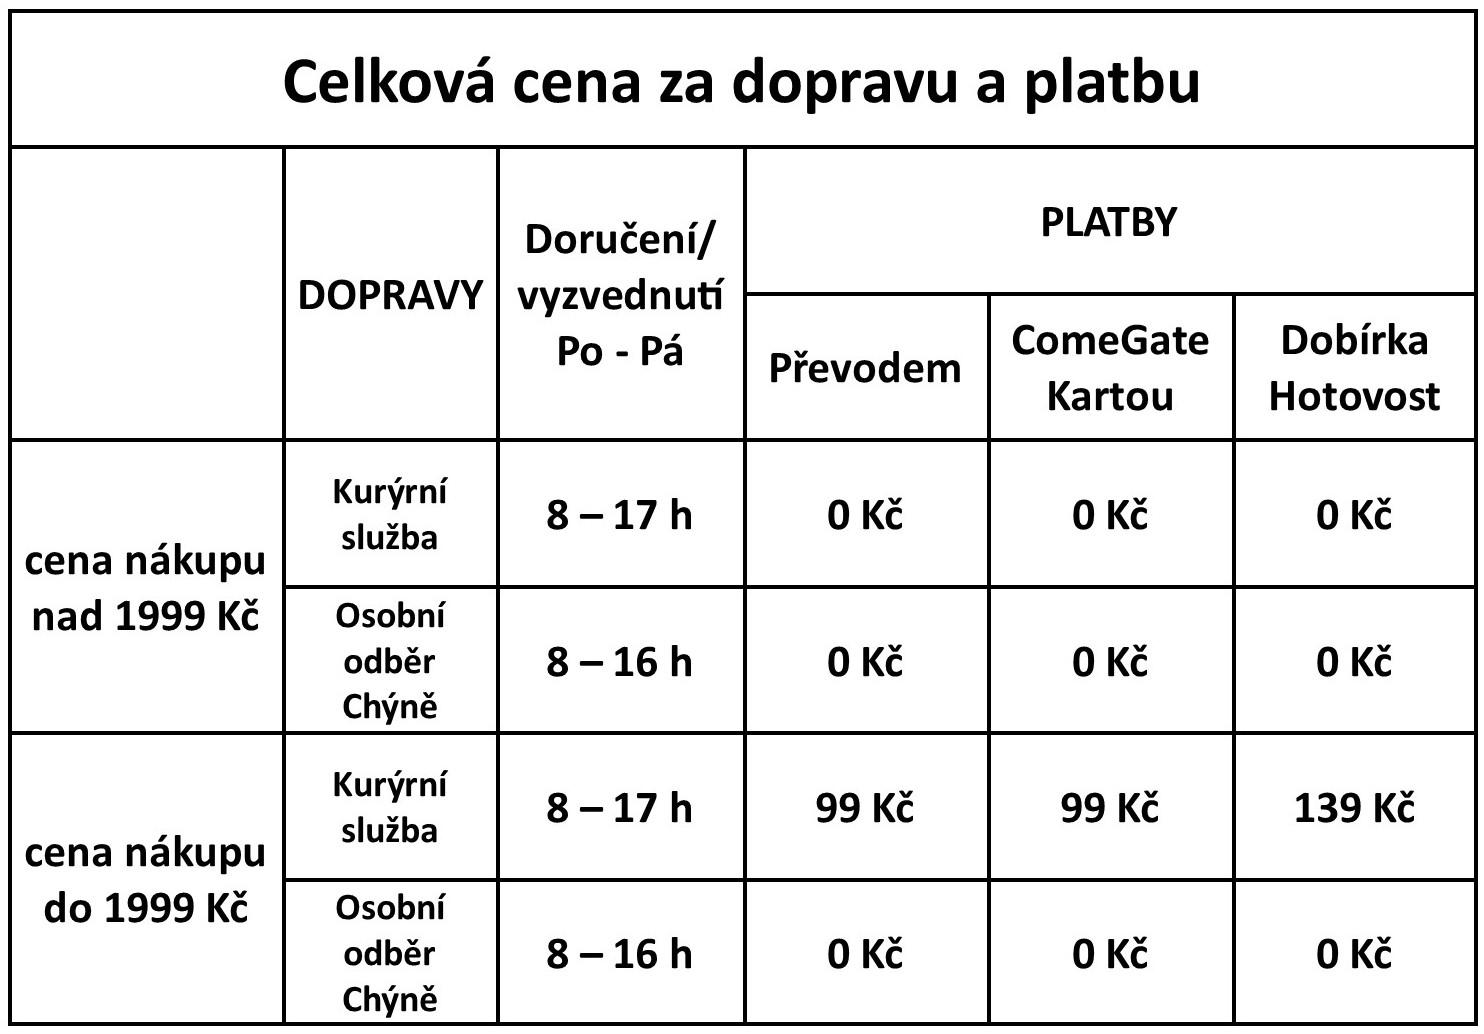 Tabulka_DopravaPlatby_nova